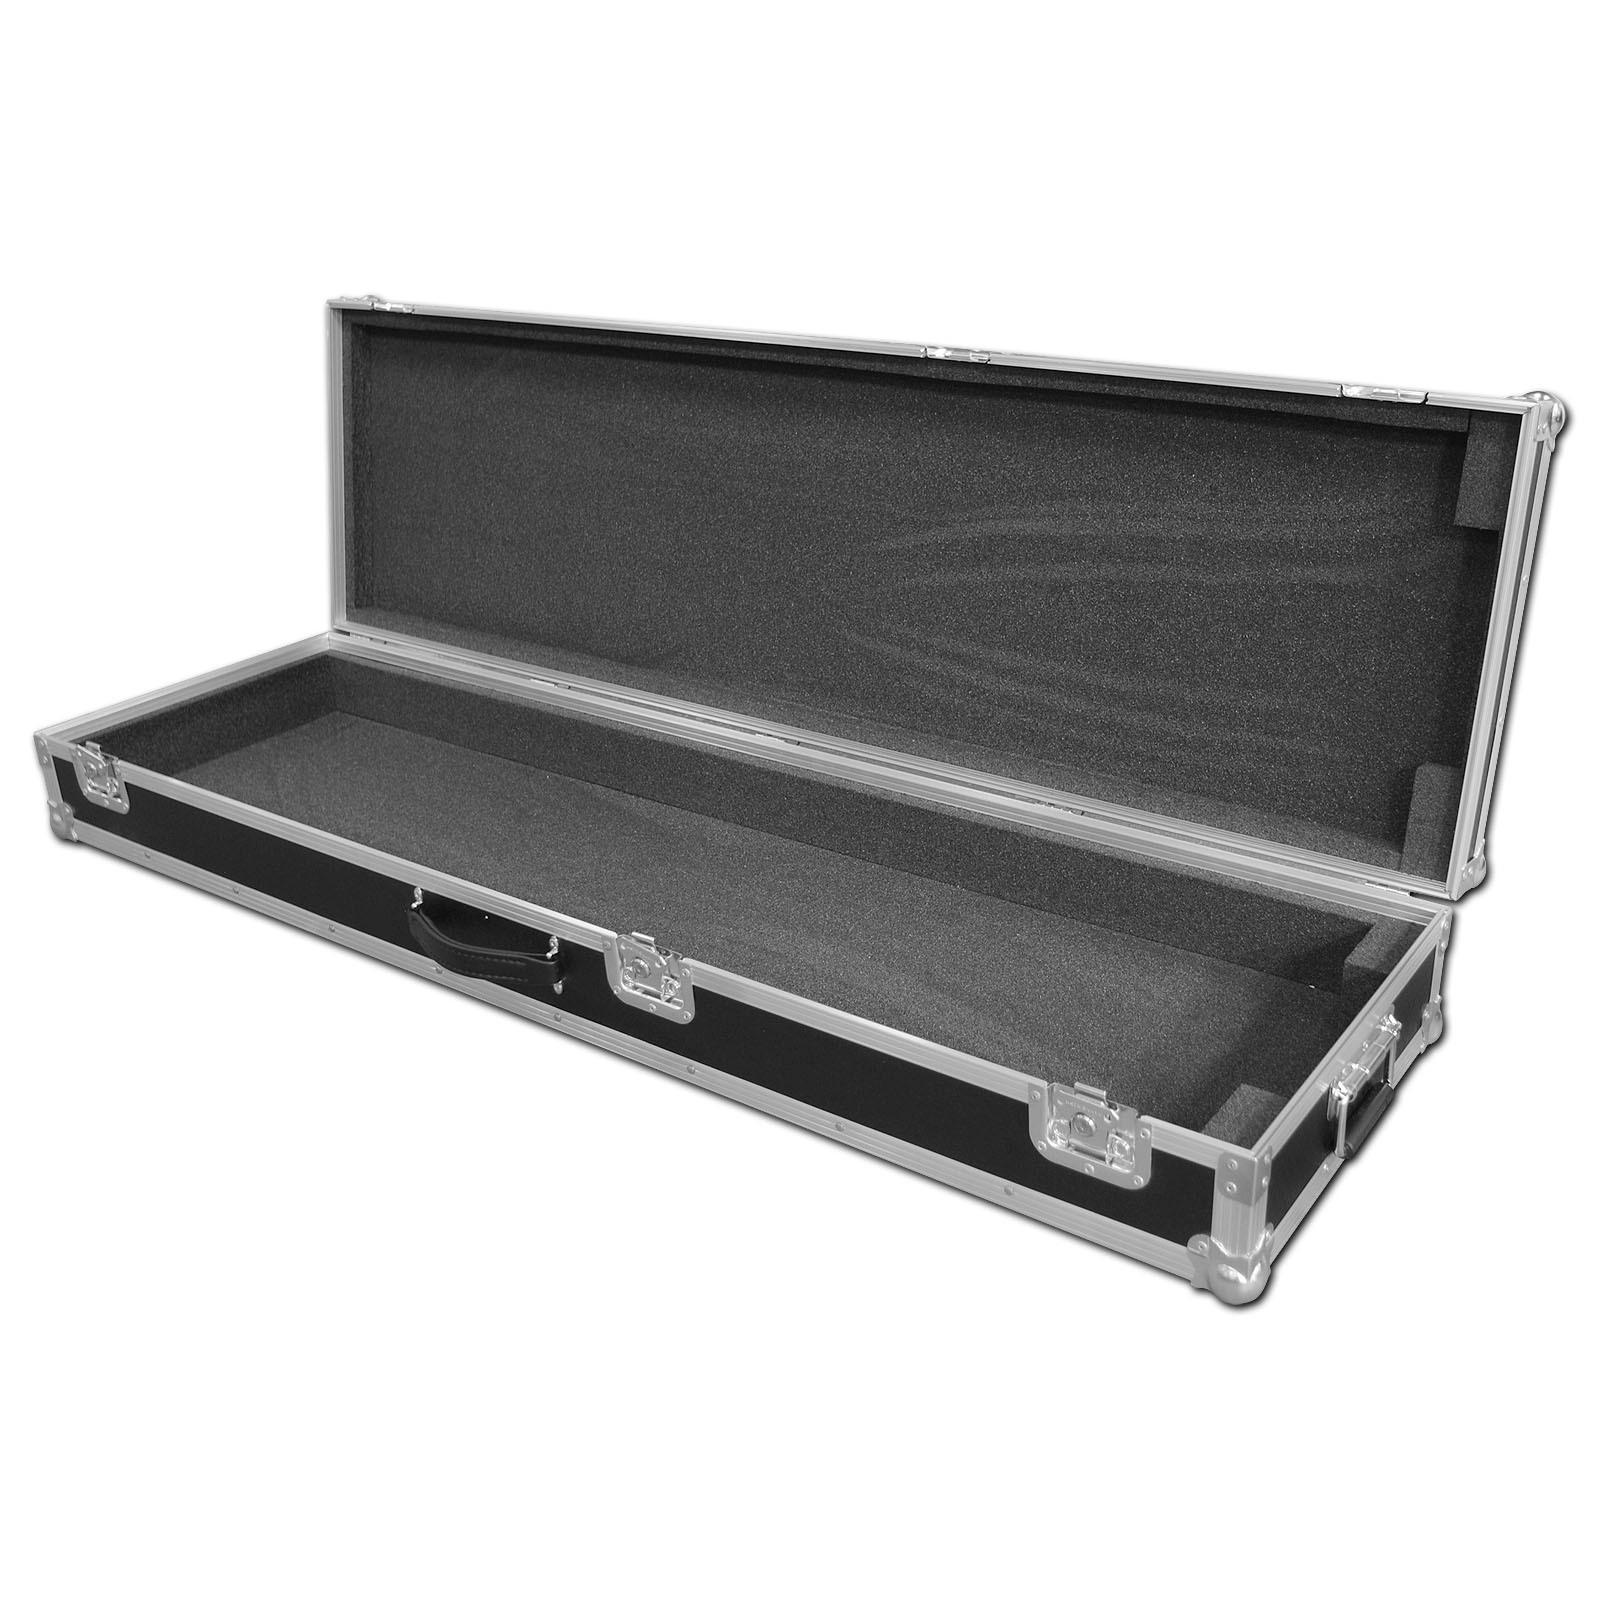 hard keyboard flight case for yamaha p120 heavy duty. Black Bedroom Furniture Sets. Home Design Ideas